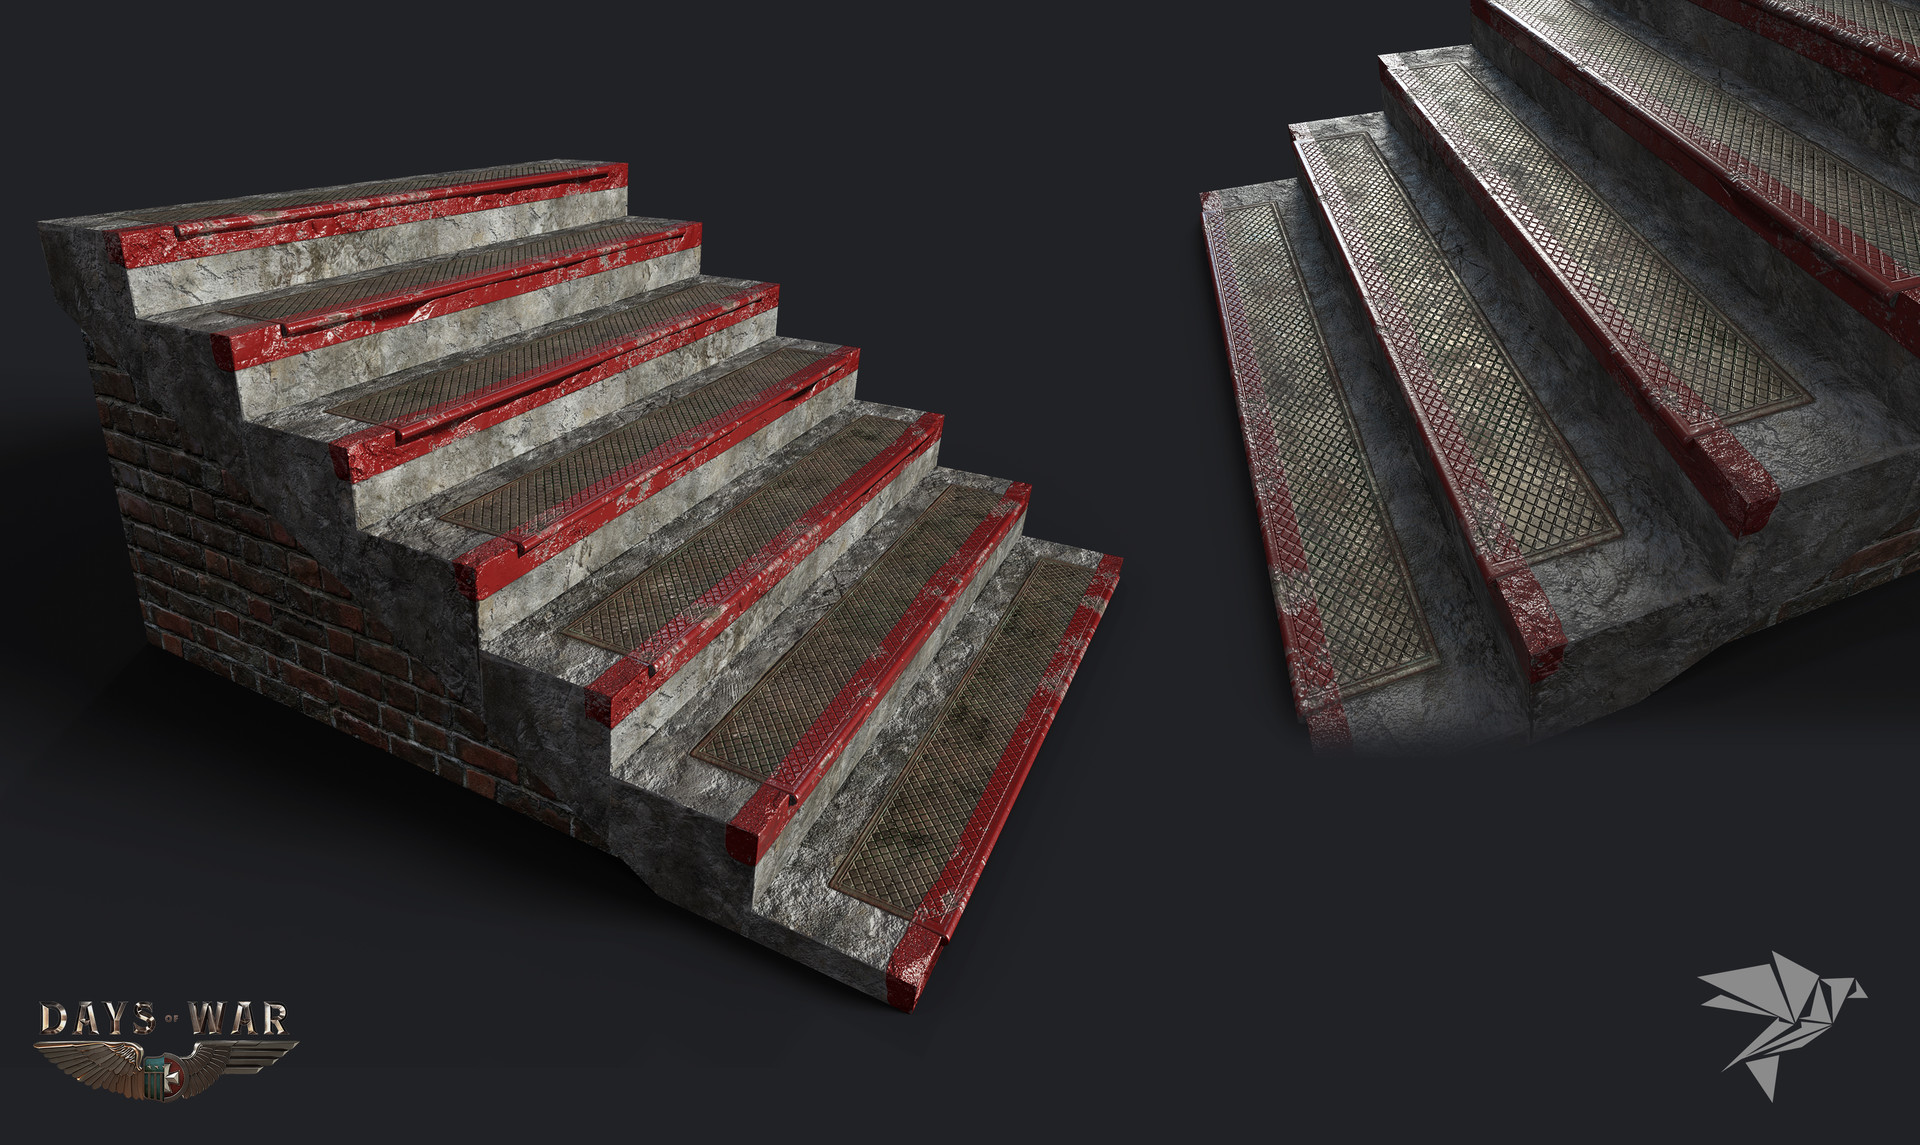 Mark ranson stairs